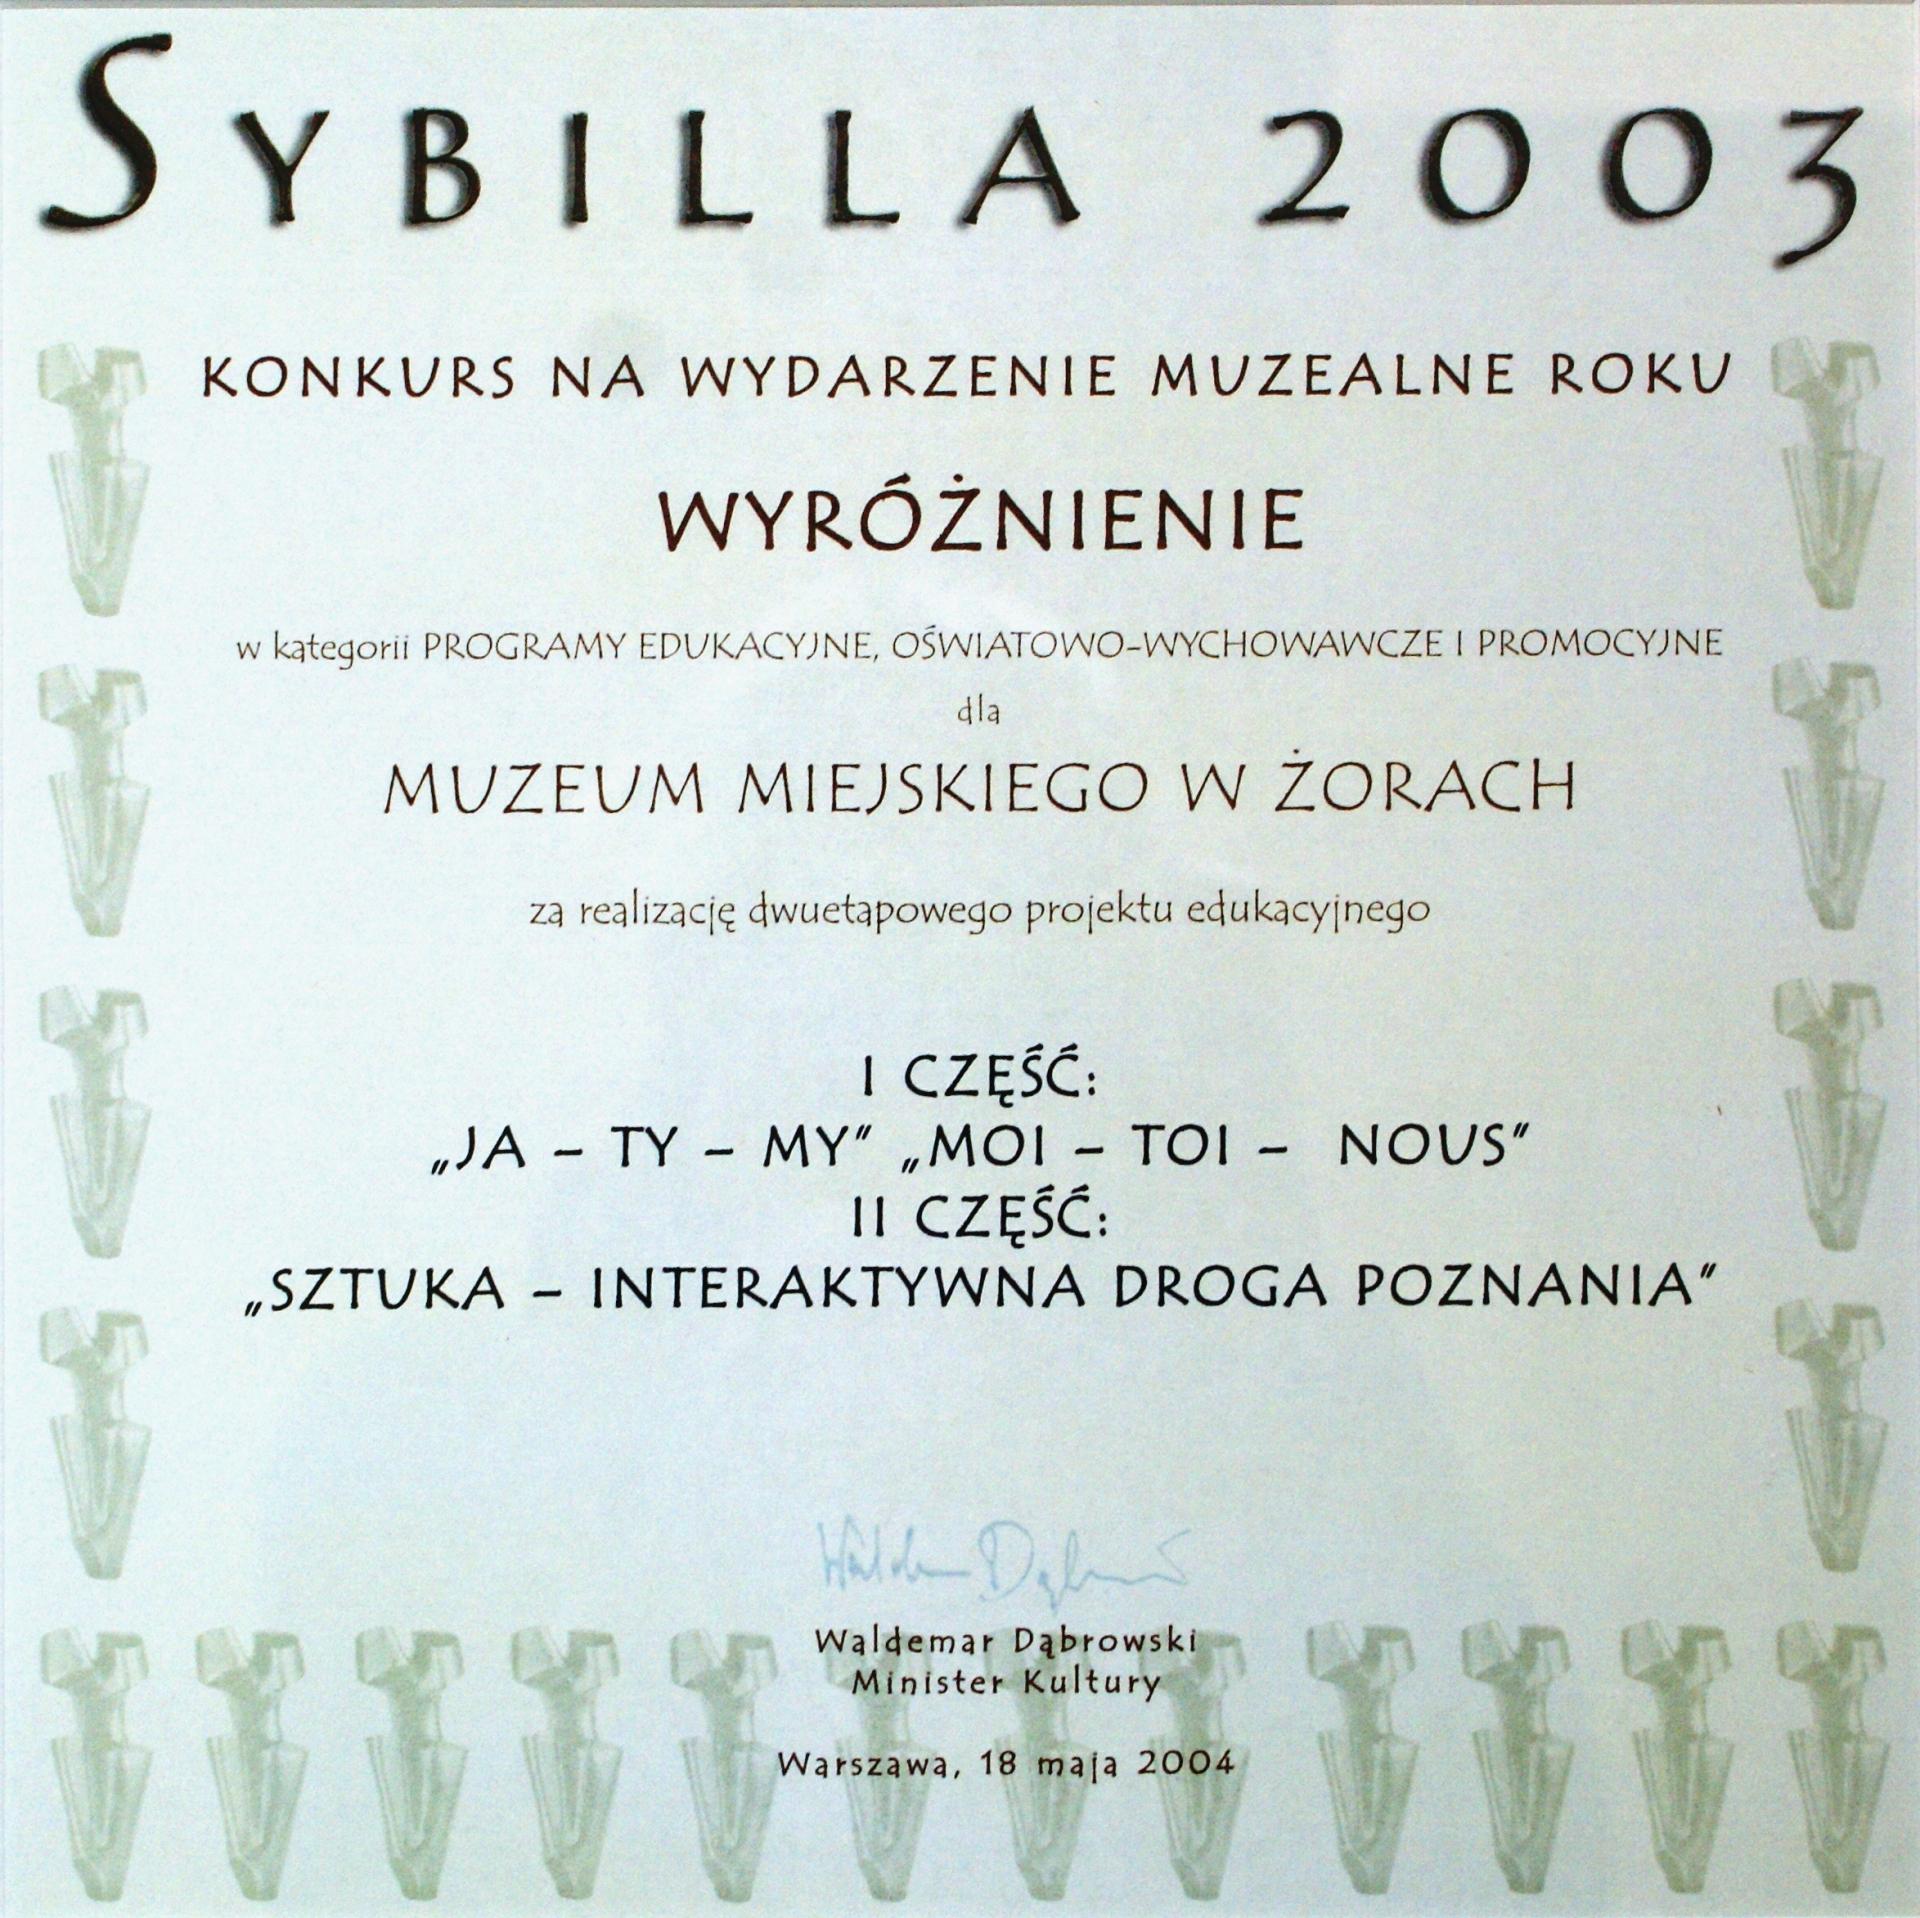 SYBILLA 2003